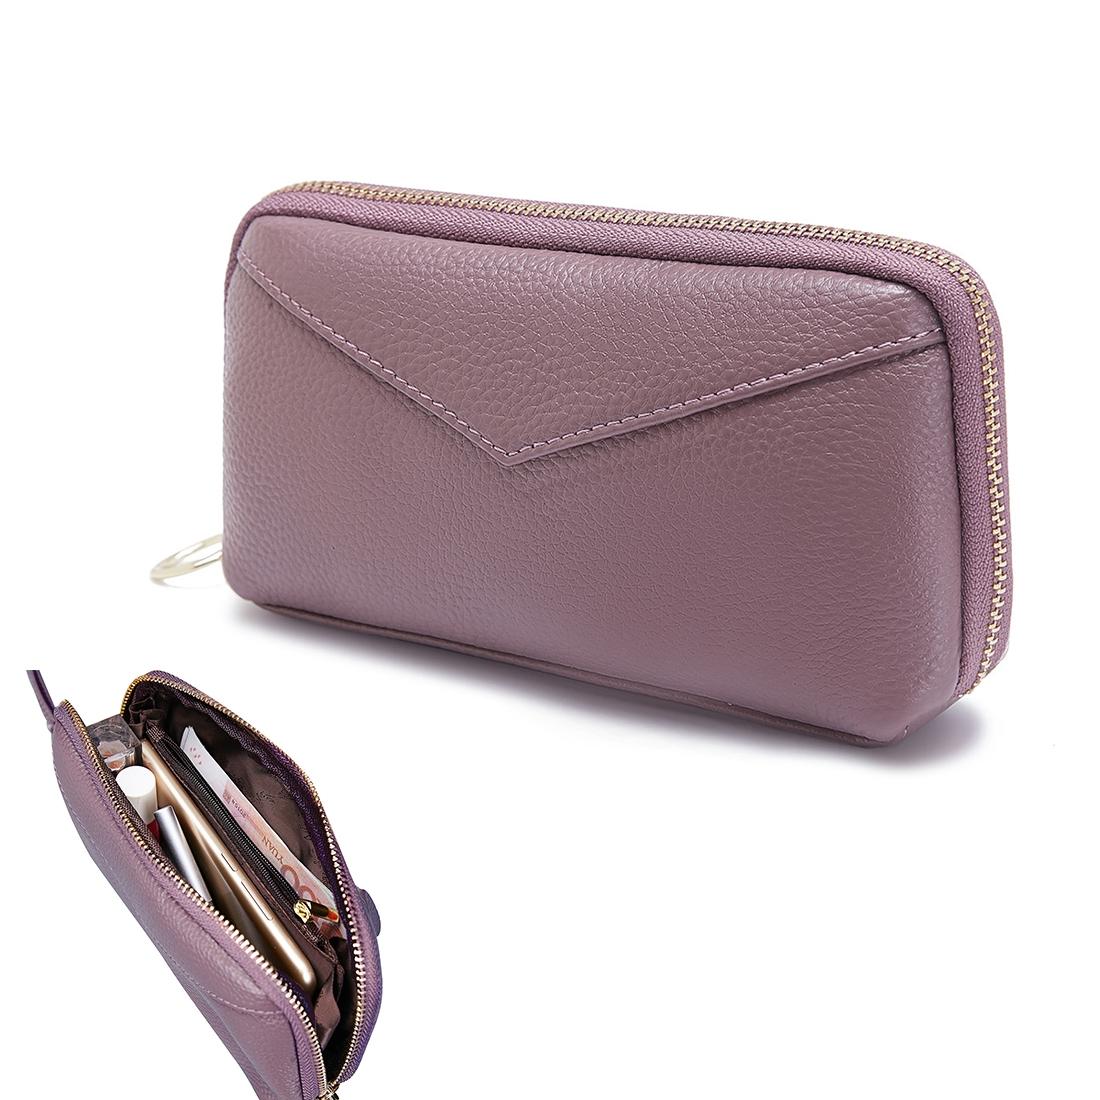 2-Folding Square Genuine Leather Handbag (Purple)